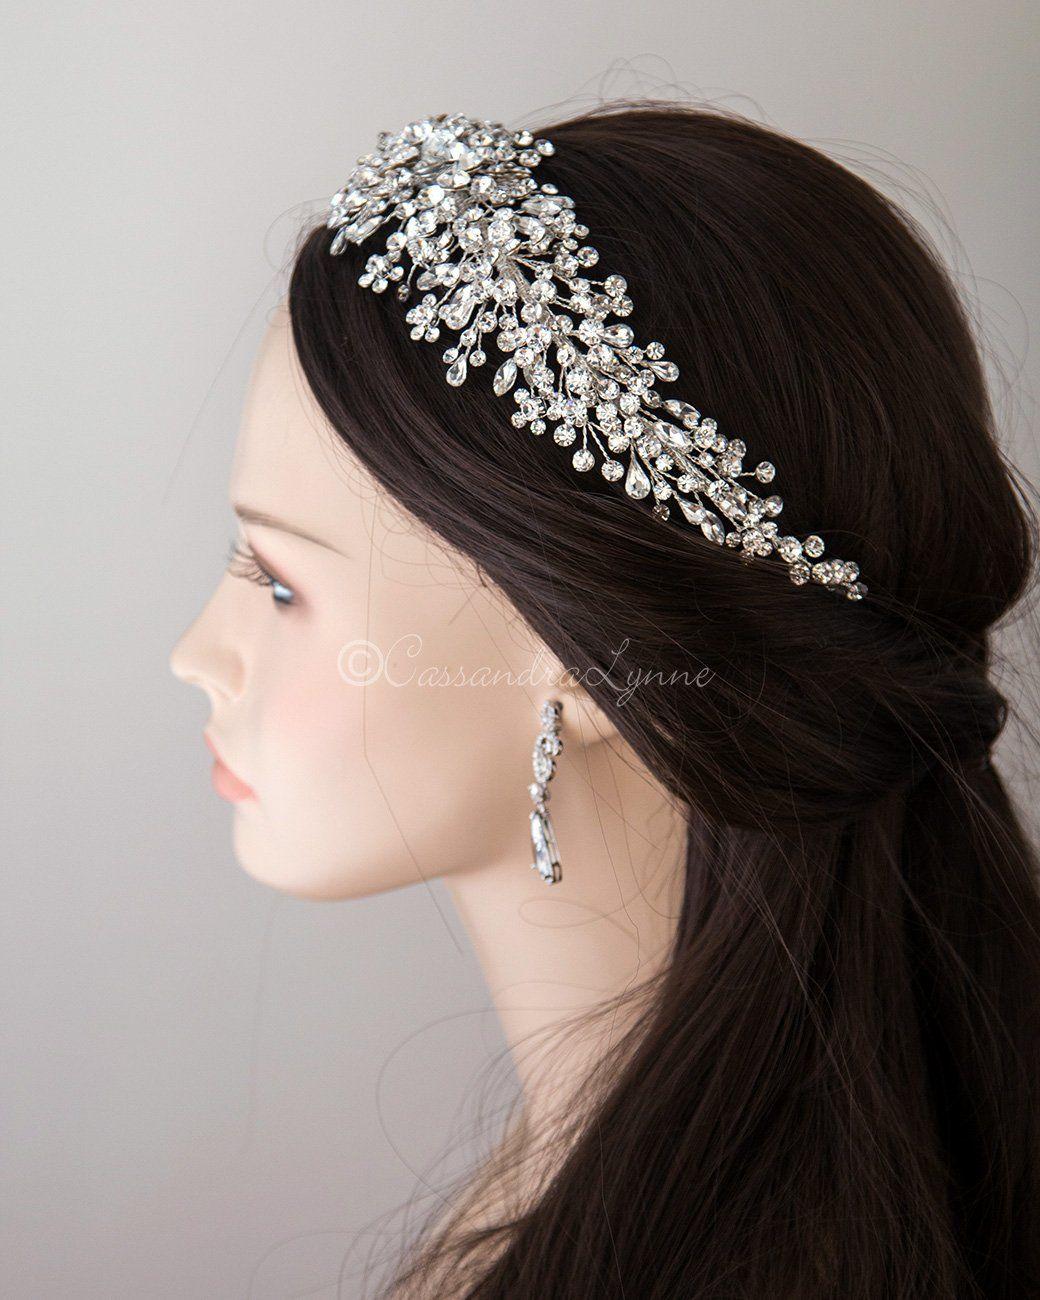 Multi Shape Jewels Wedding Headpiece Wedding Headpiece Jewel Wedding Headpiece Wedding